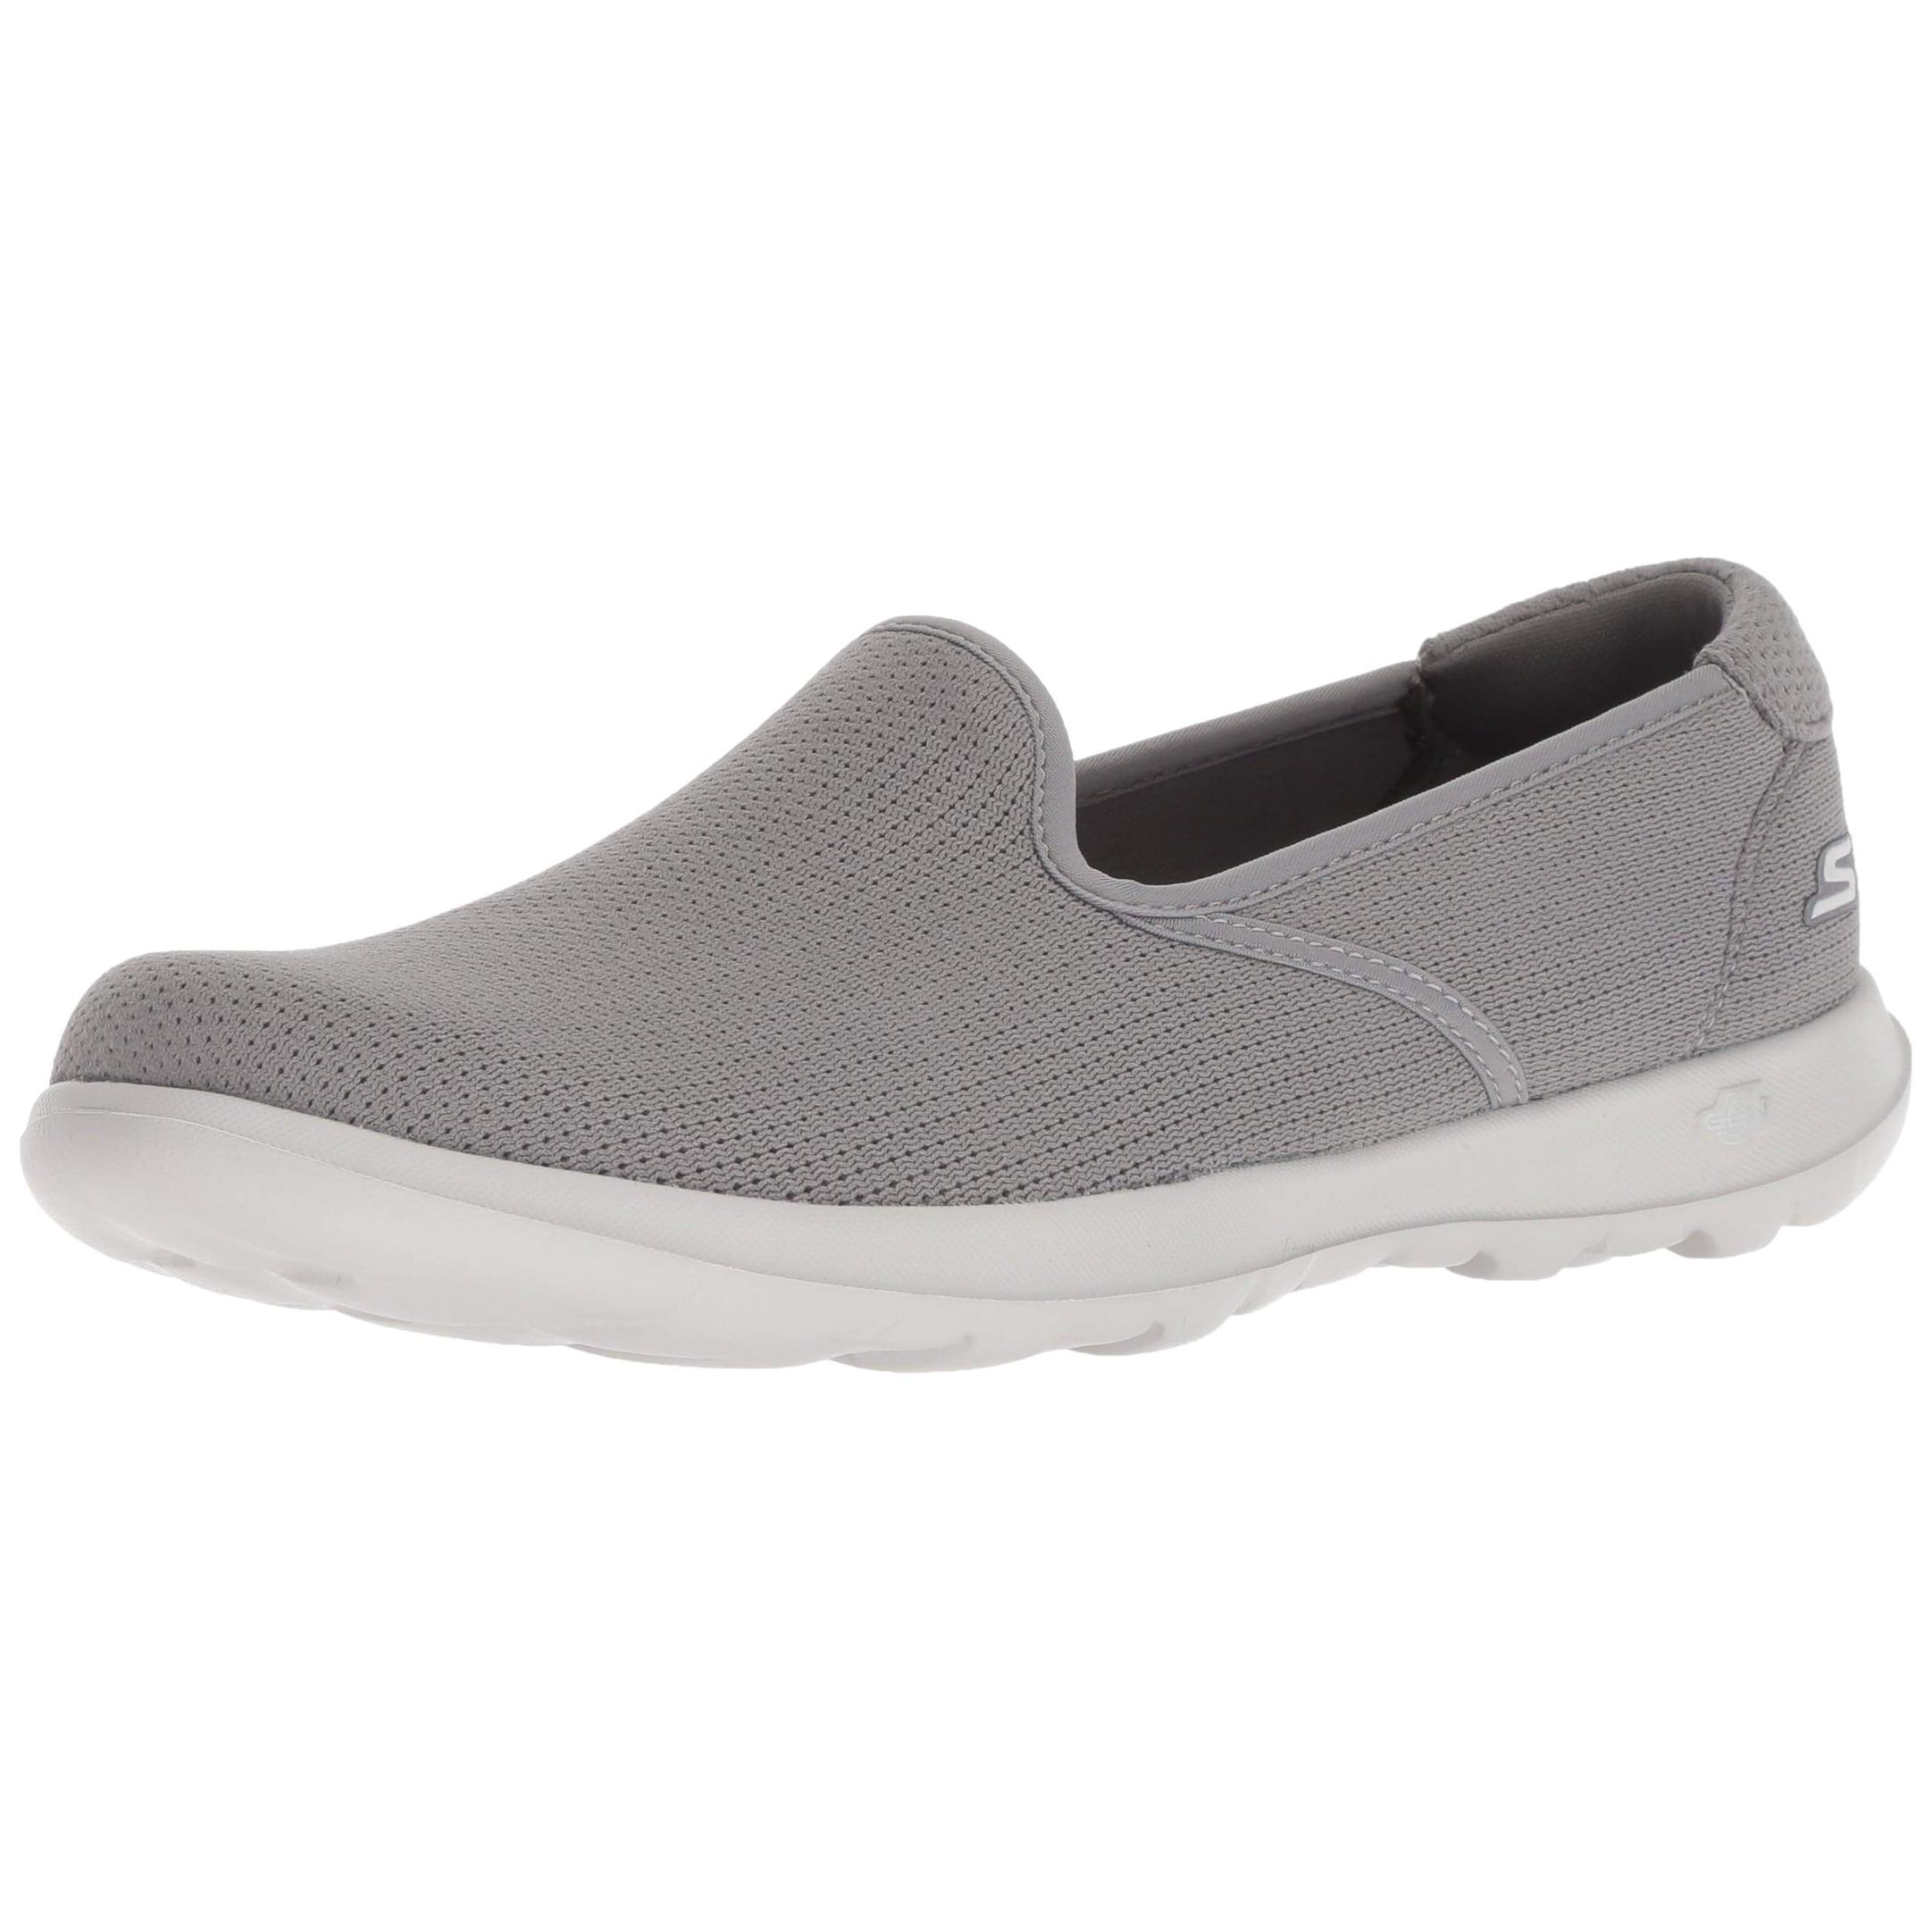 Go Walk Lite Heavenly Loafer Flat,Gray